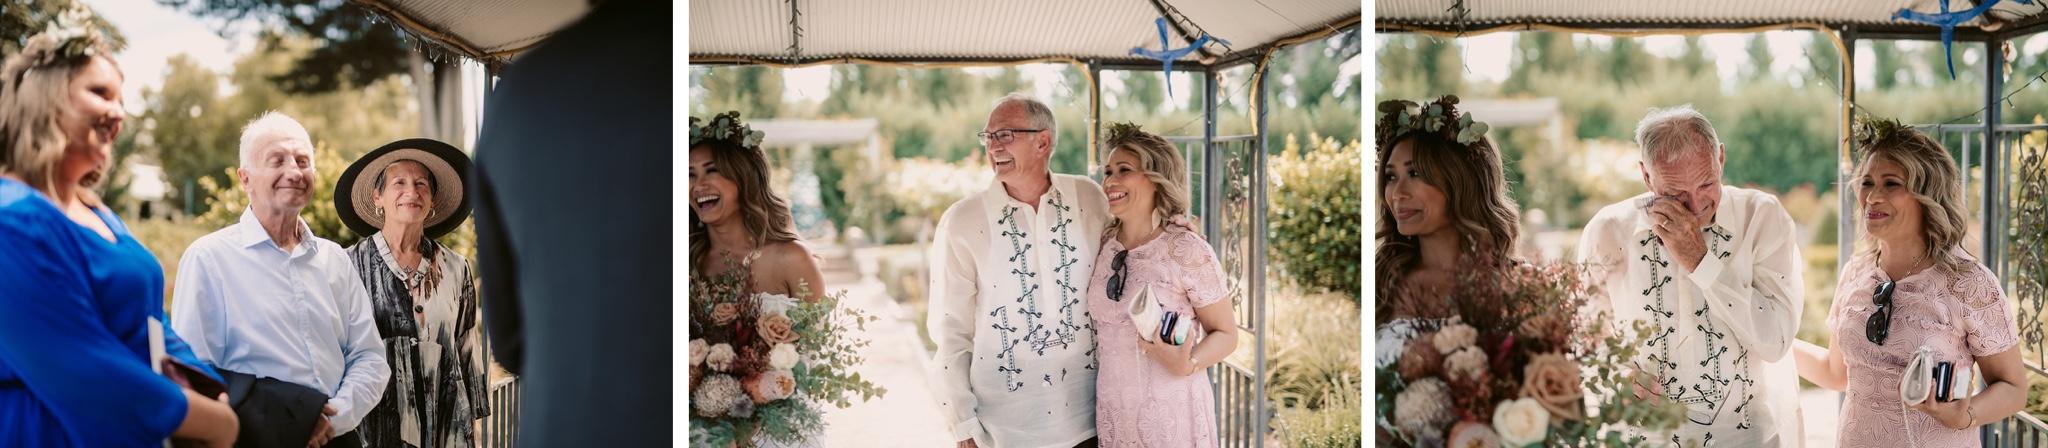 Wedstival Festival Wedding Photographer Yarra Valley44.jpg